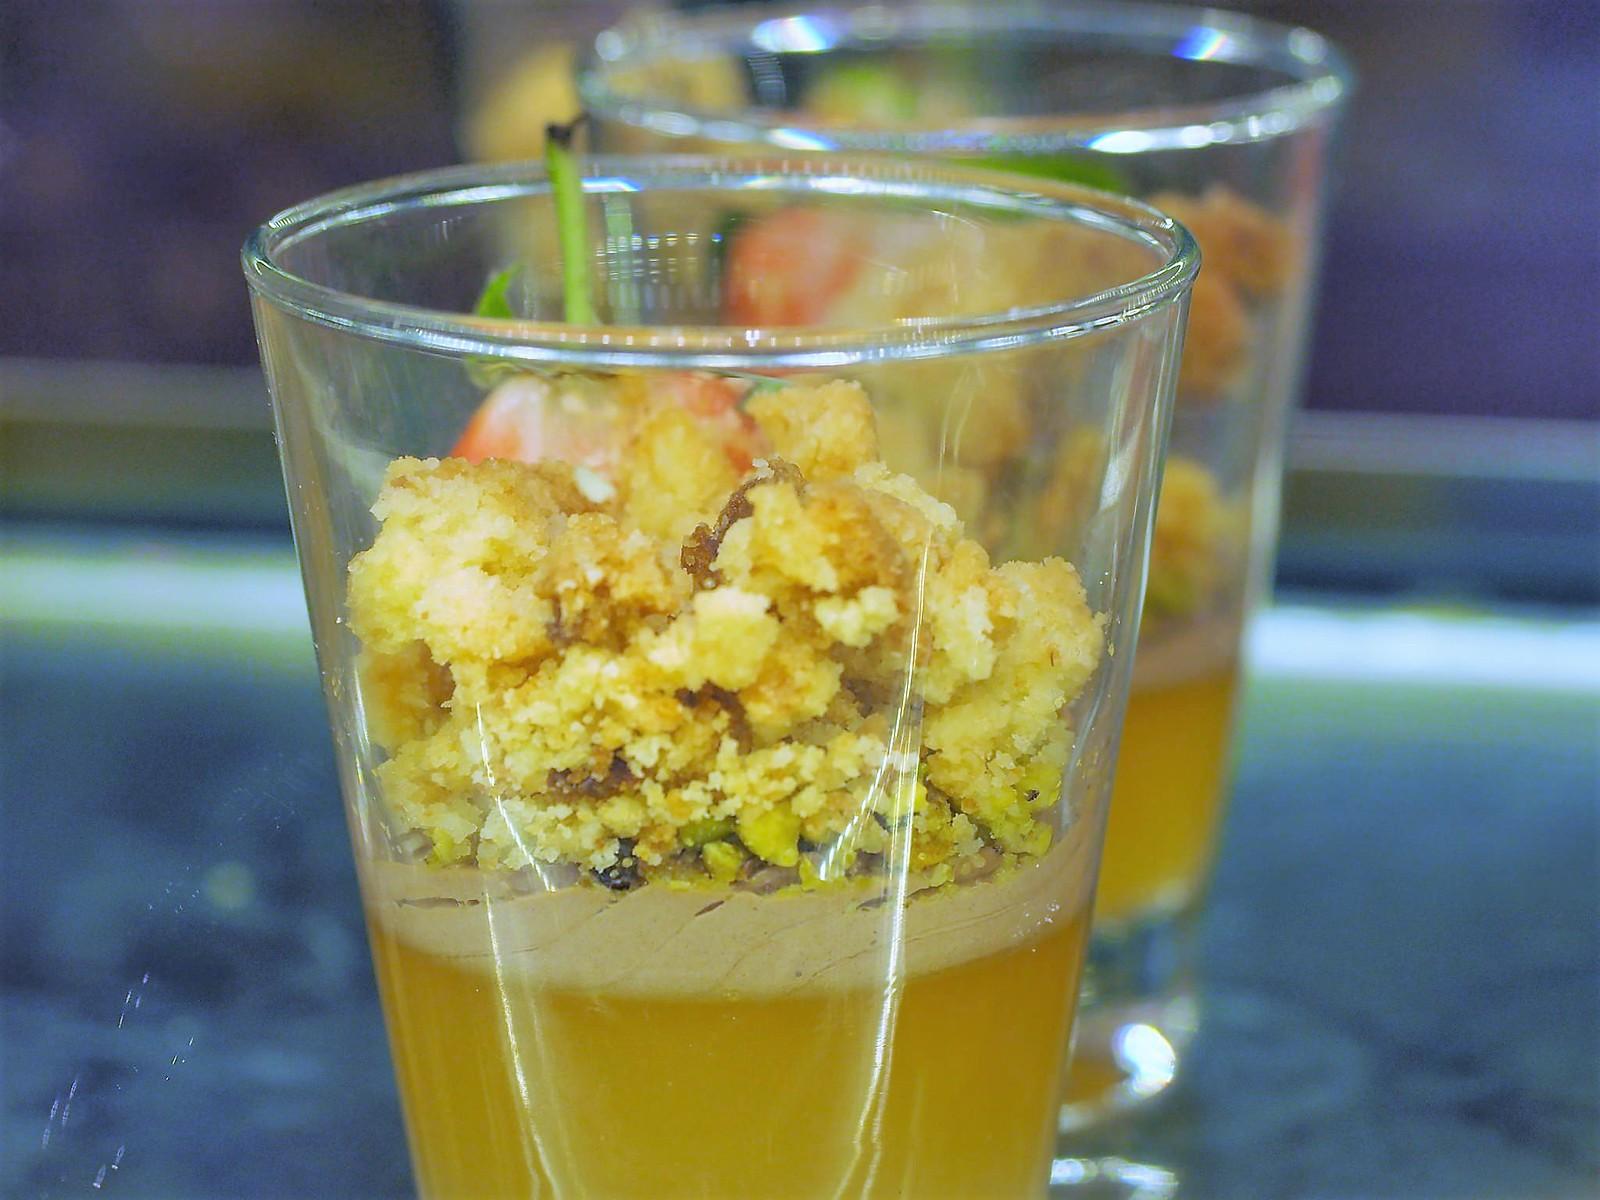 Dessert in glass